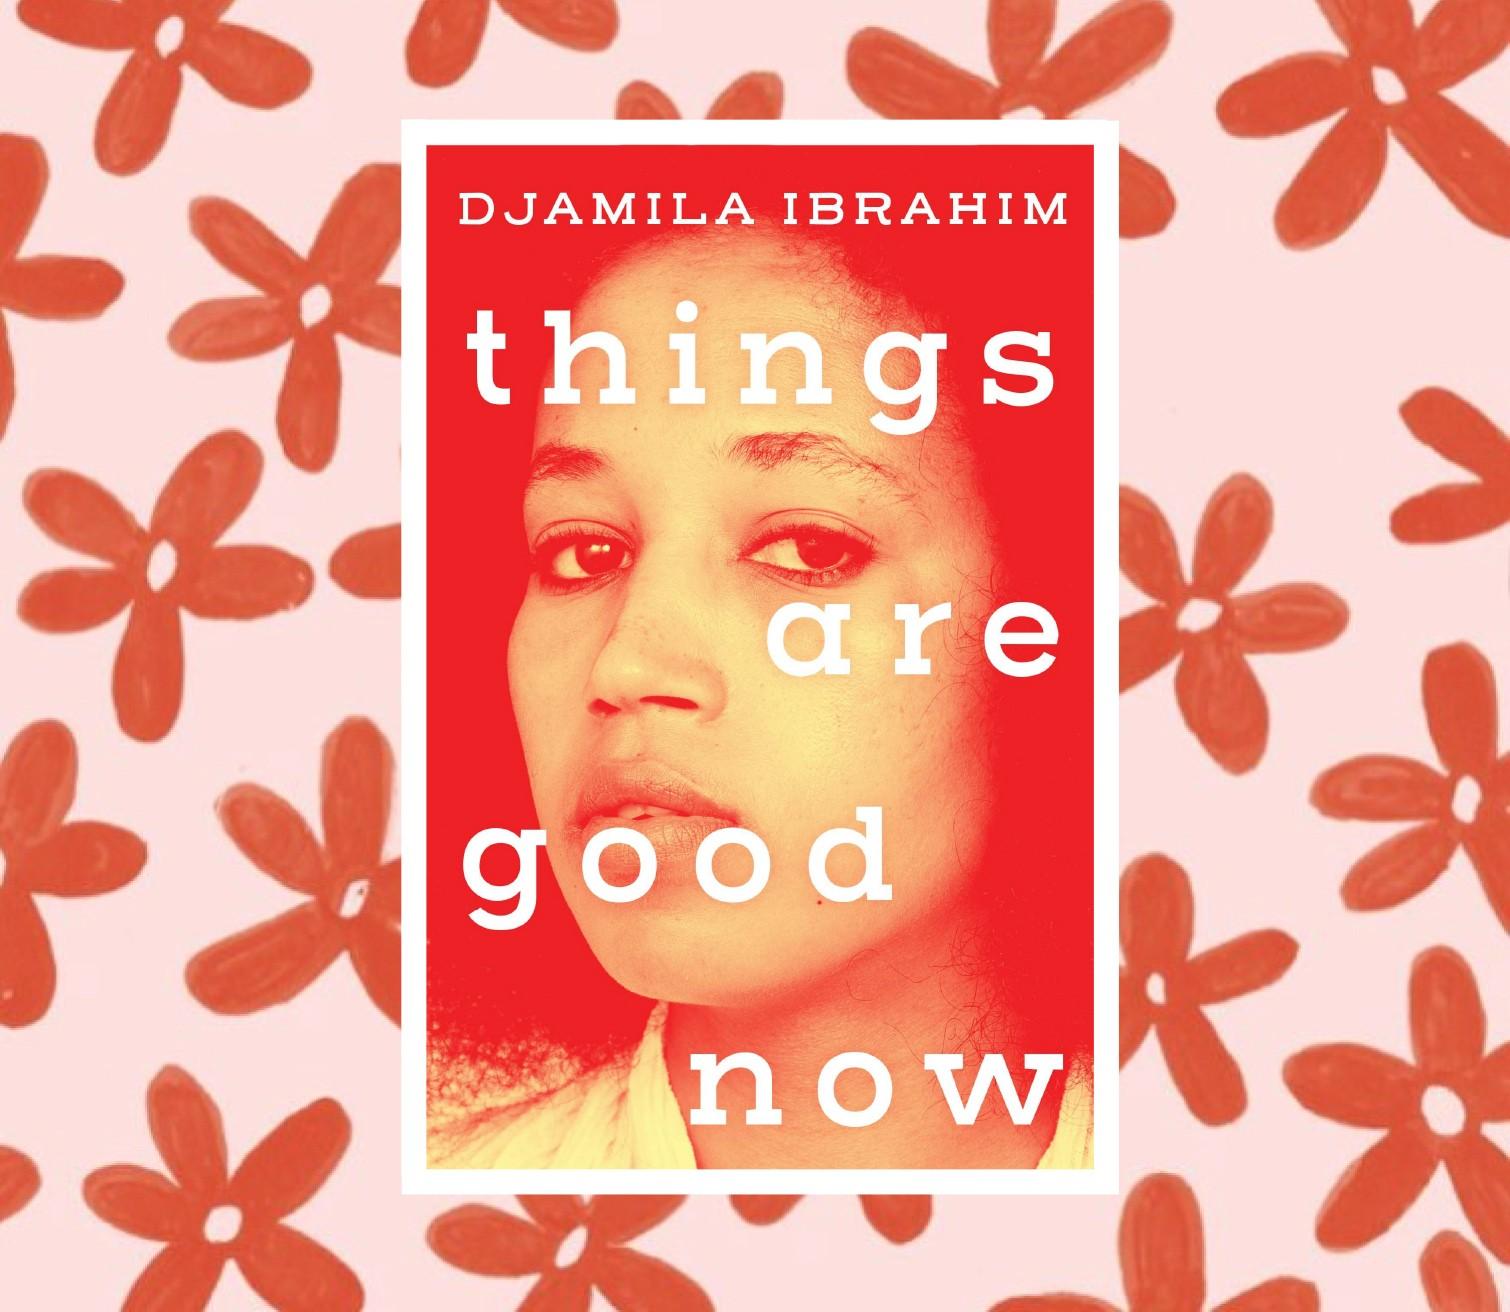 Things are Good Now Djamila Ibrahim - Short Stories By Women Toronto 2018 Edit Seven